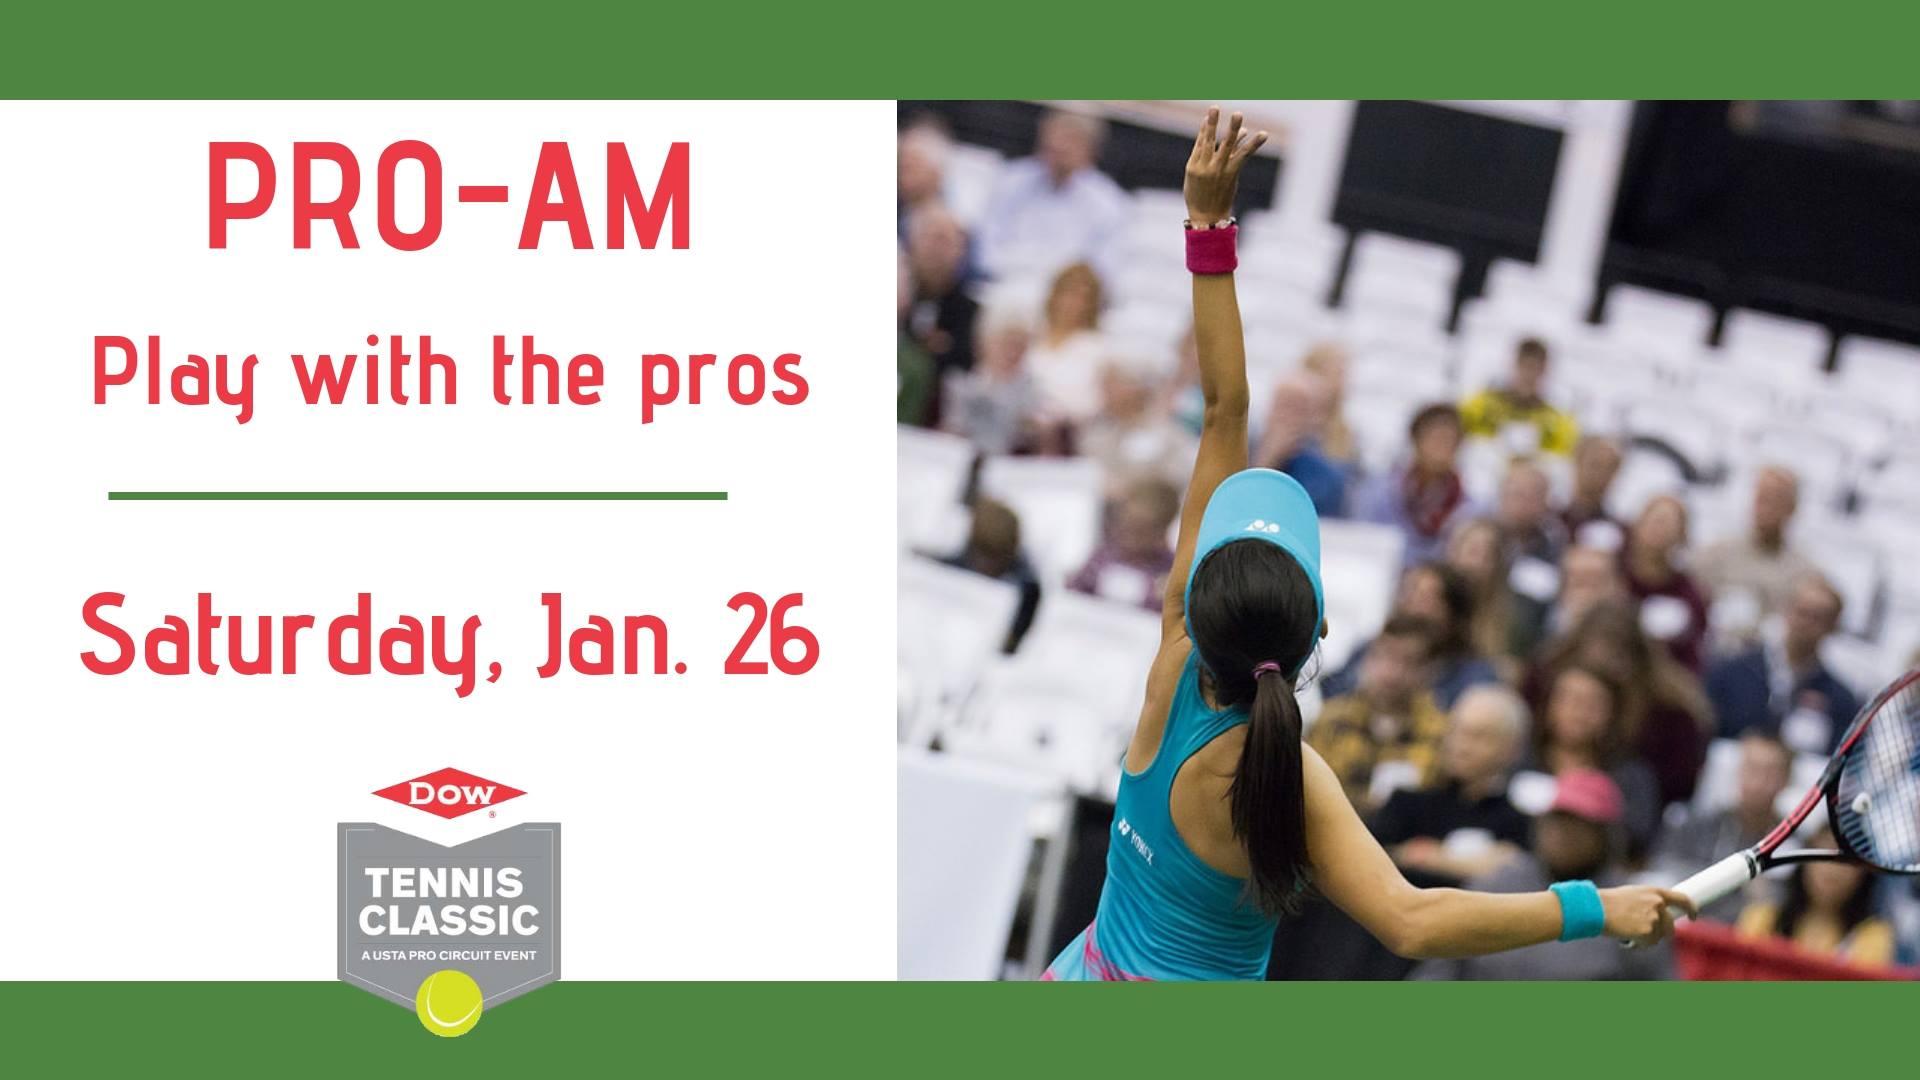 Dow Tennis Classic - Pro-Am